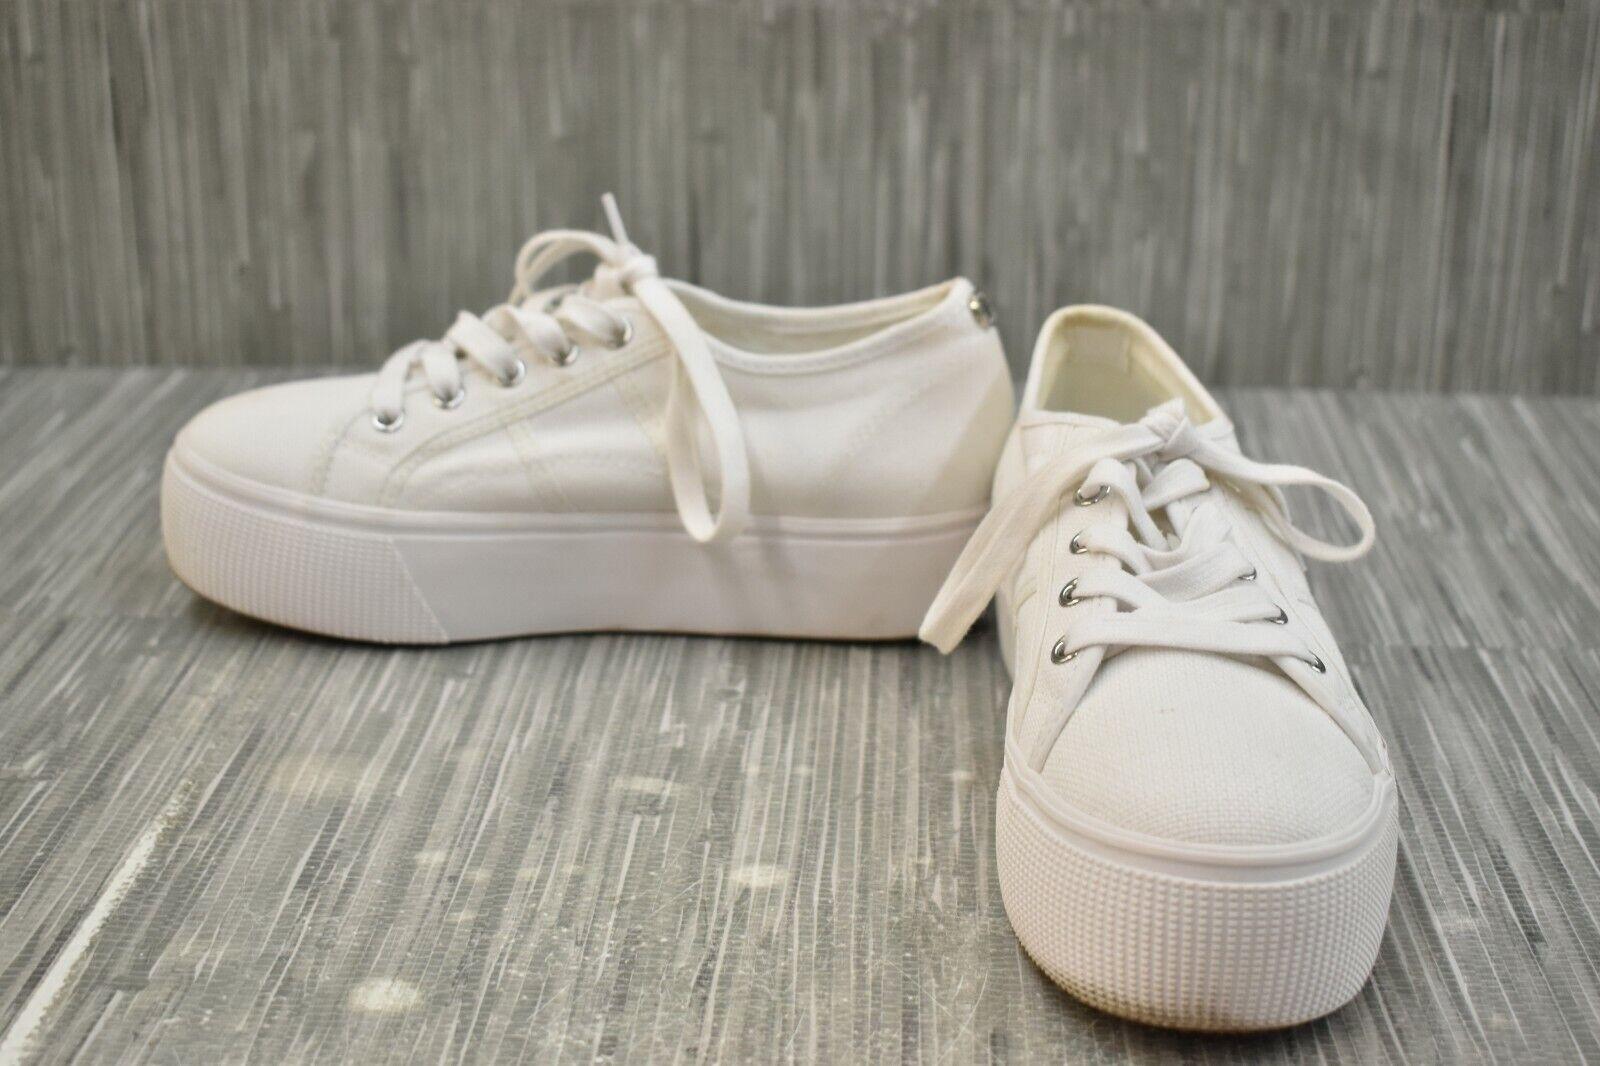 Steve Madden Emmi Platform Sneakers